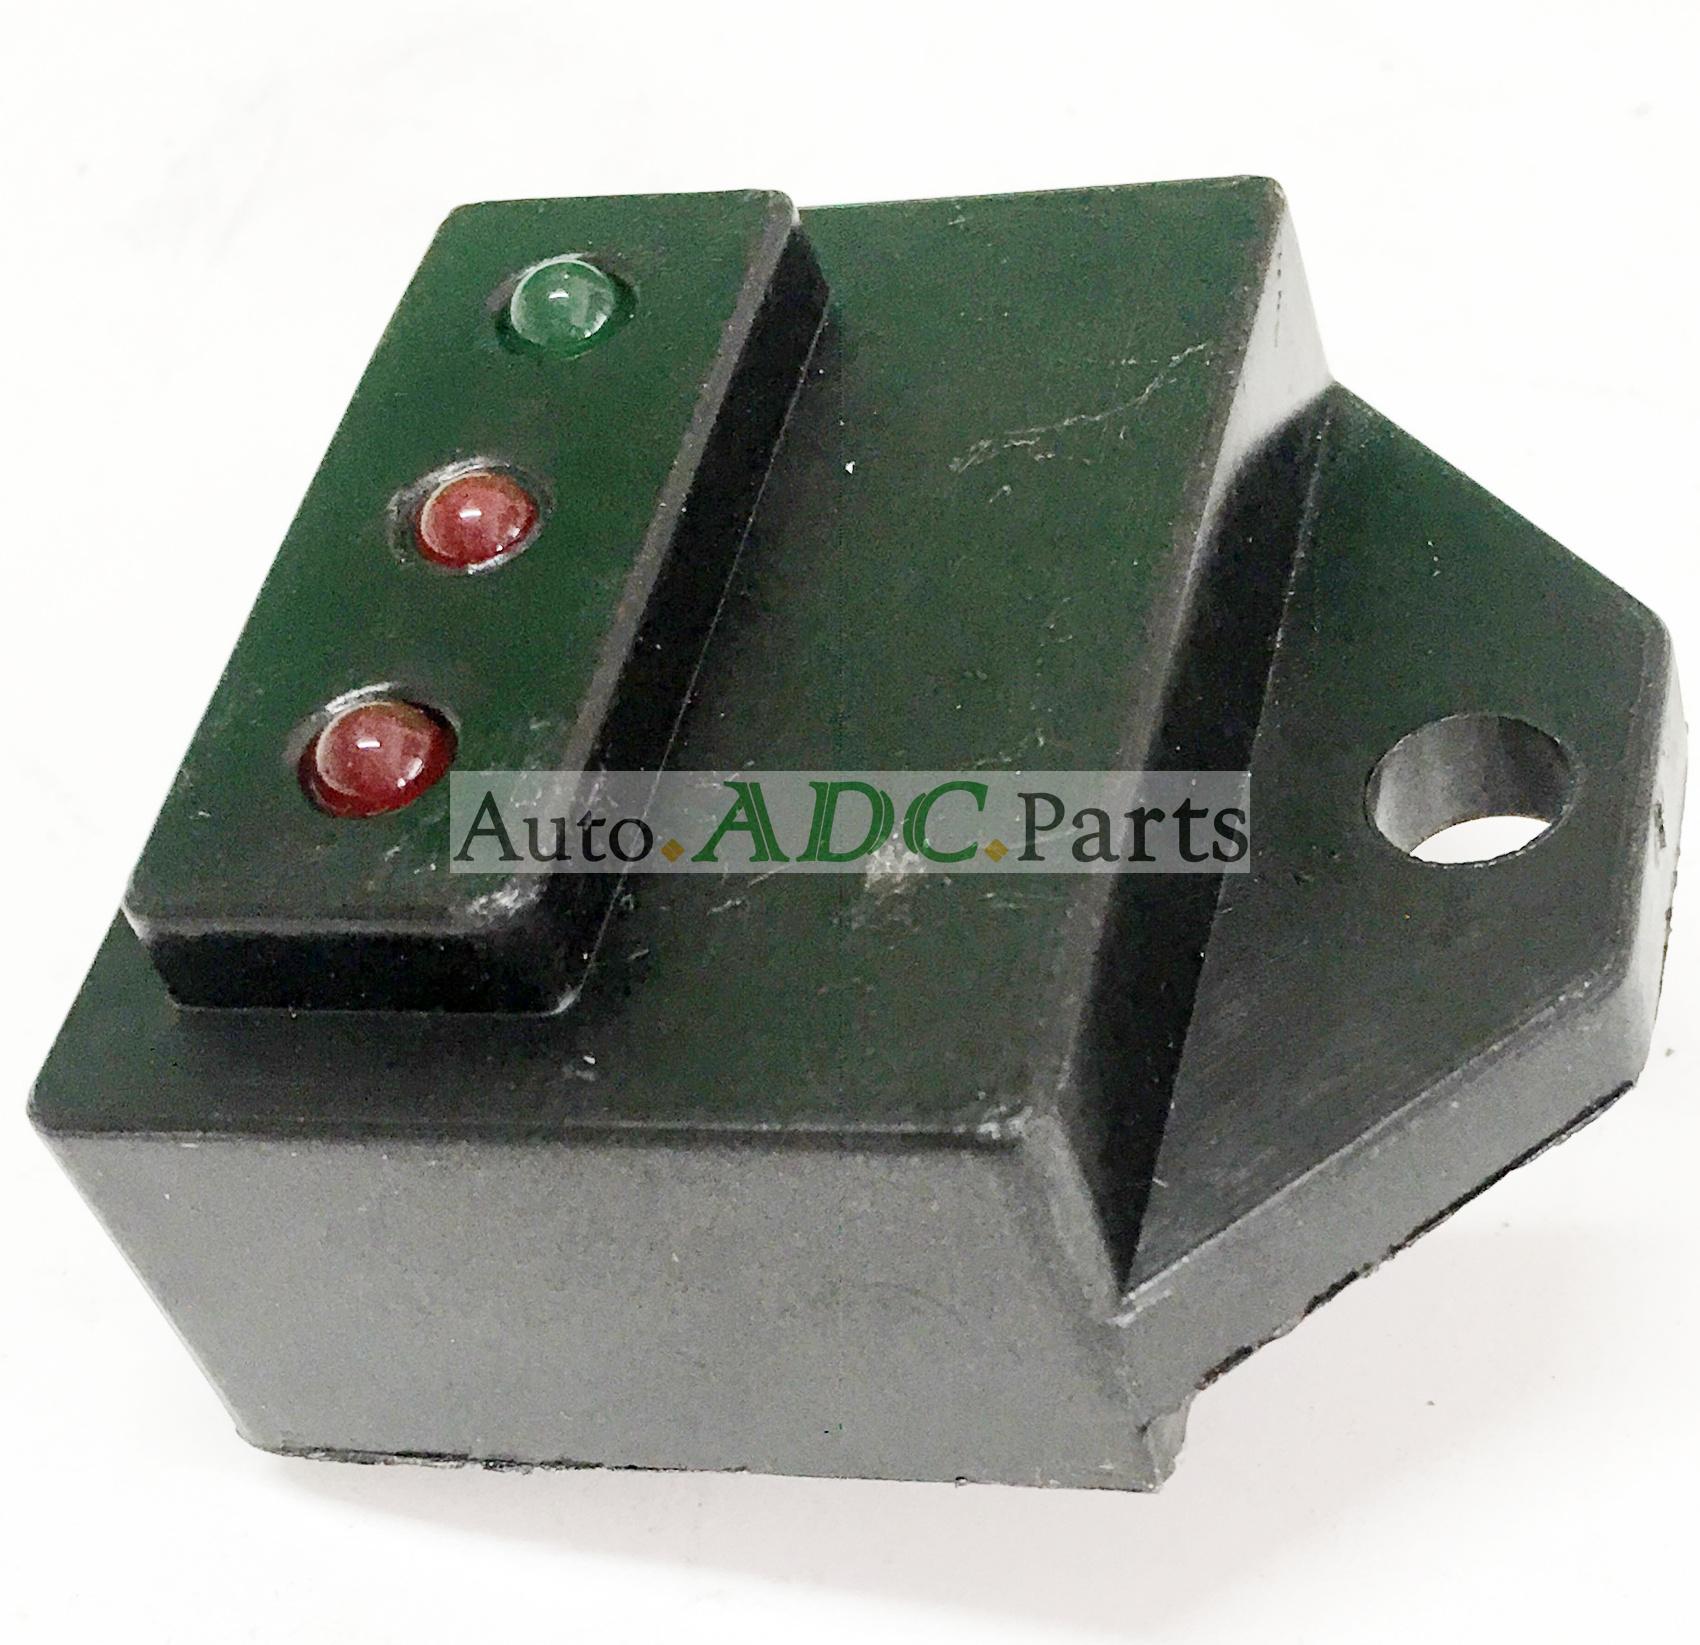 For Kipor IG3000 Digital Gasoline Generator Parts Truck Parts 3 IN 1 Ignition Module KI-DHQ-30